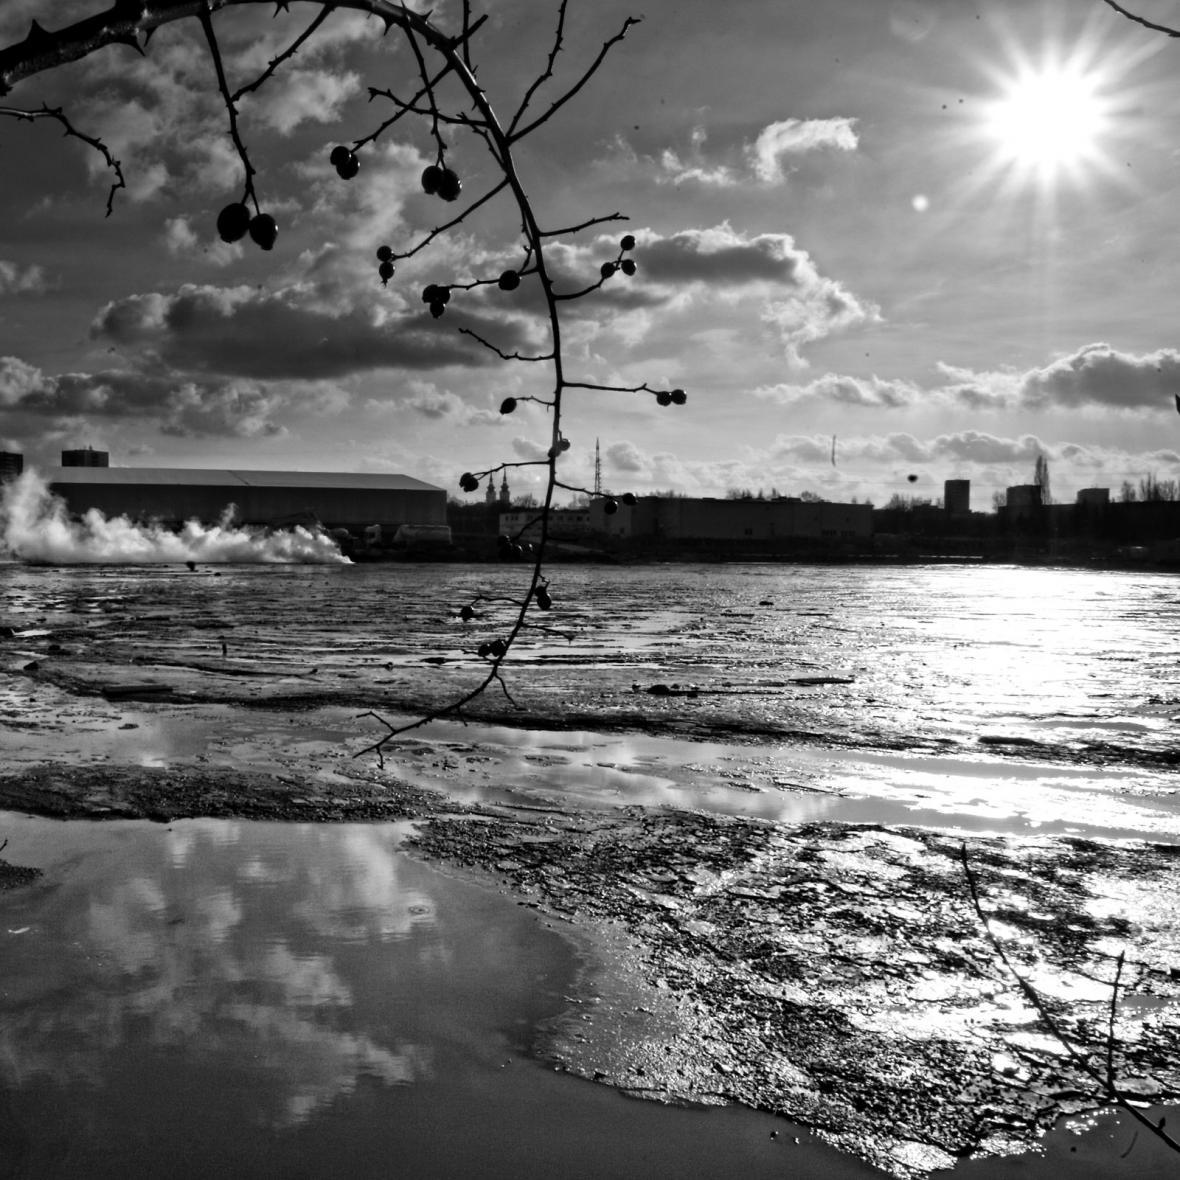 Ropné laguny - Ostrava dnes